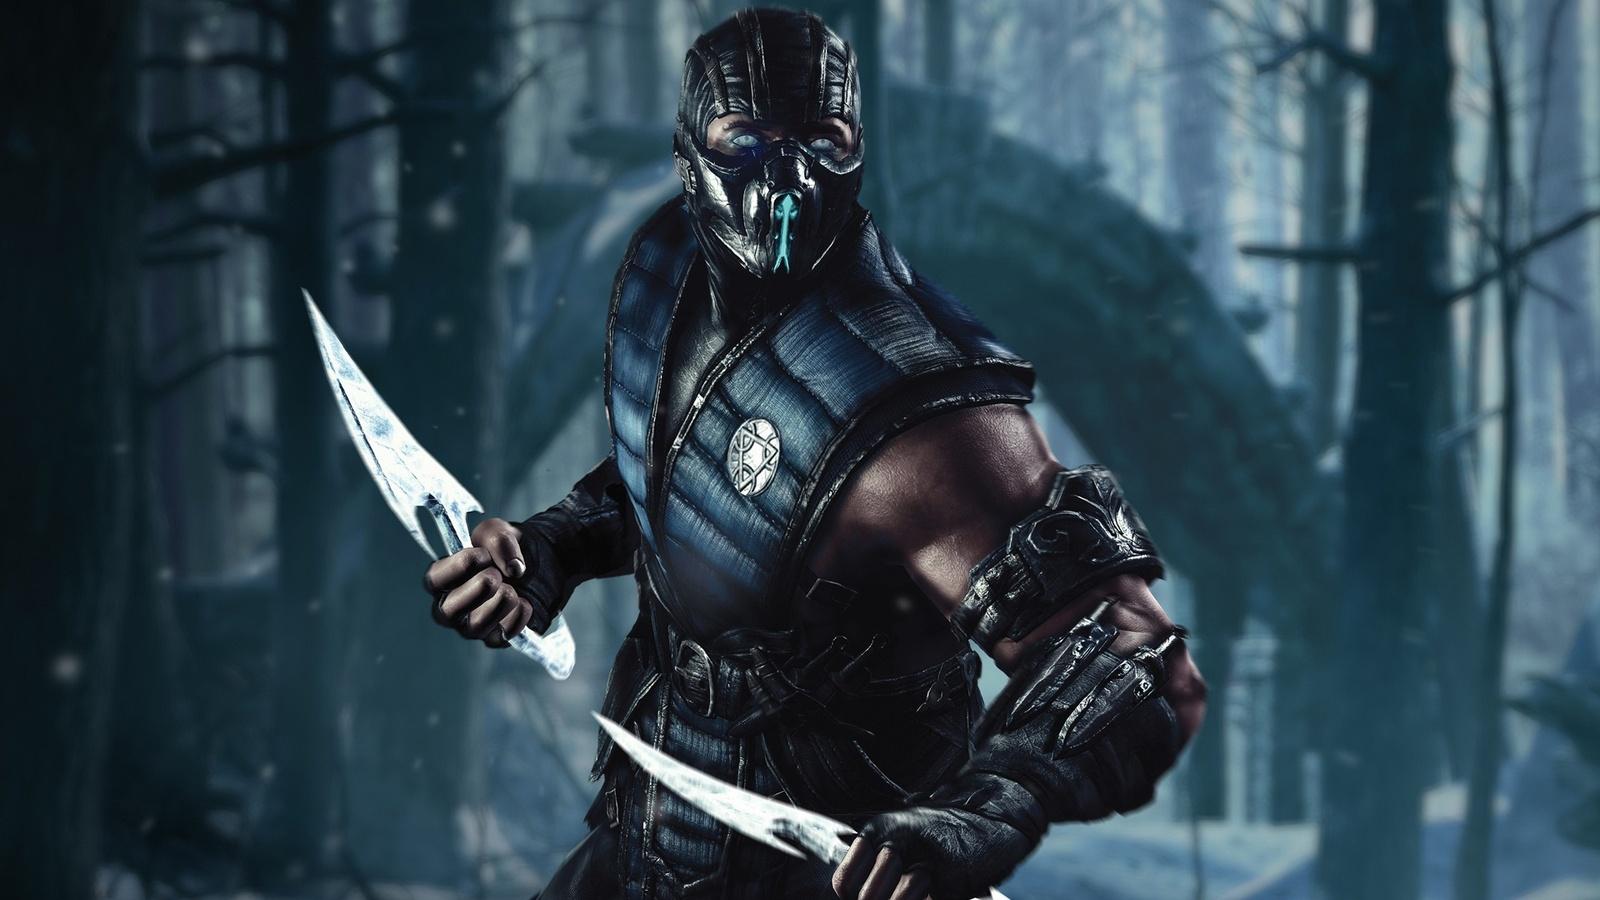 Mortal Kombat X Sub Zero Poster 12x19 inches (32x49cm ...